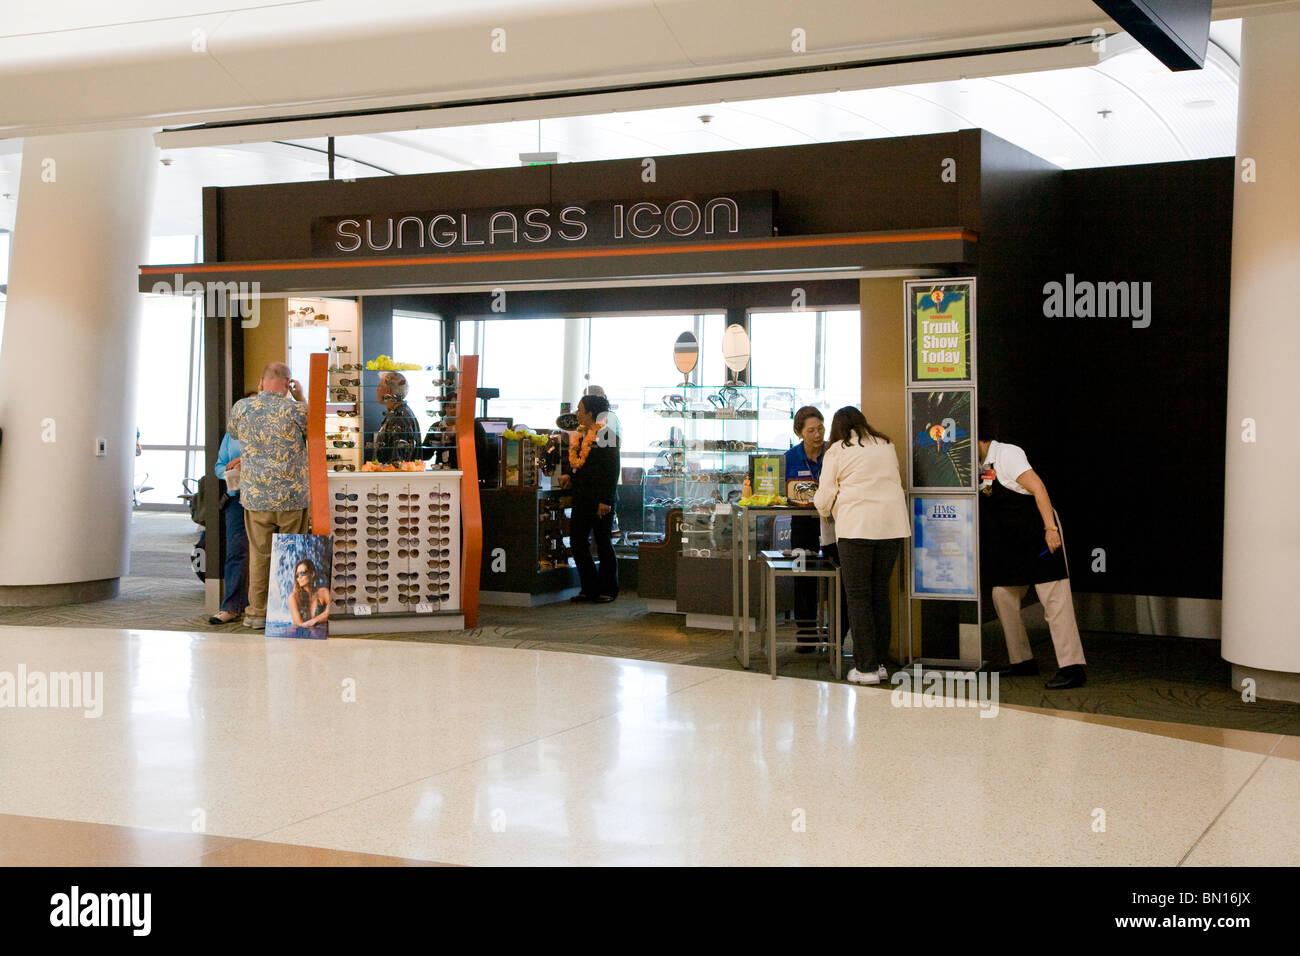 Sunglass Icon Booth at Terminal B in Mineta San Jose International Airport - Stock Image